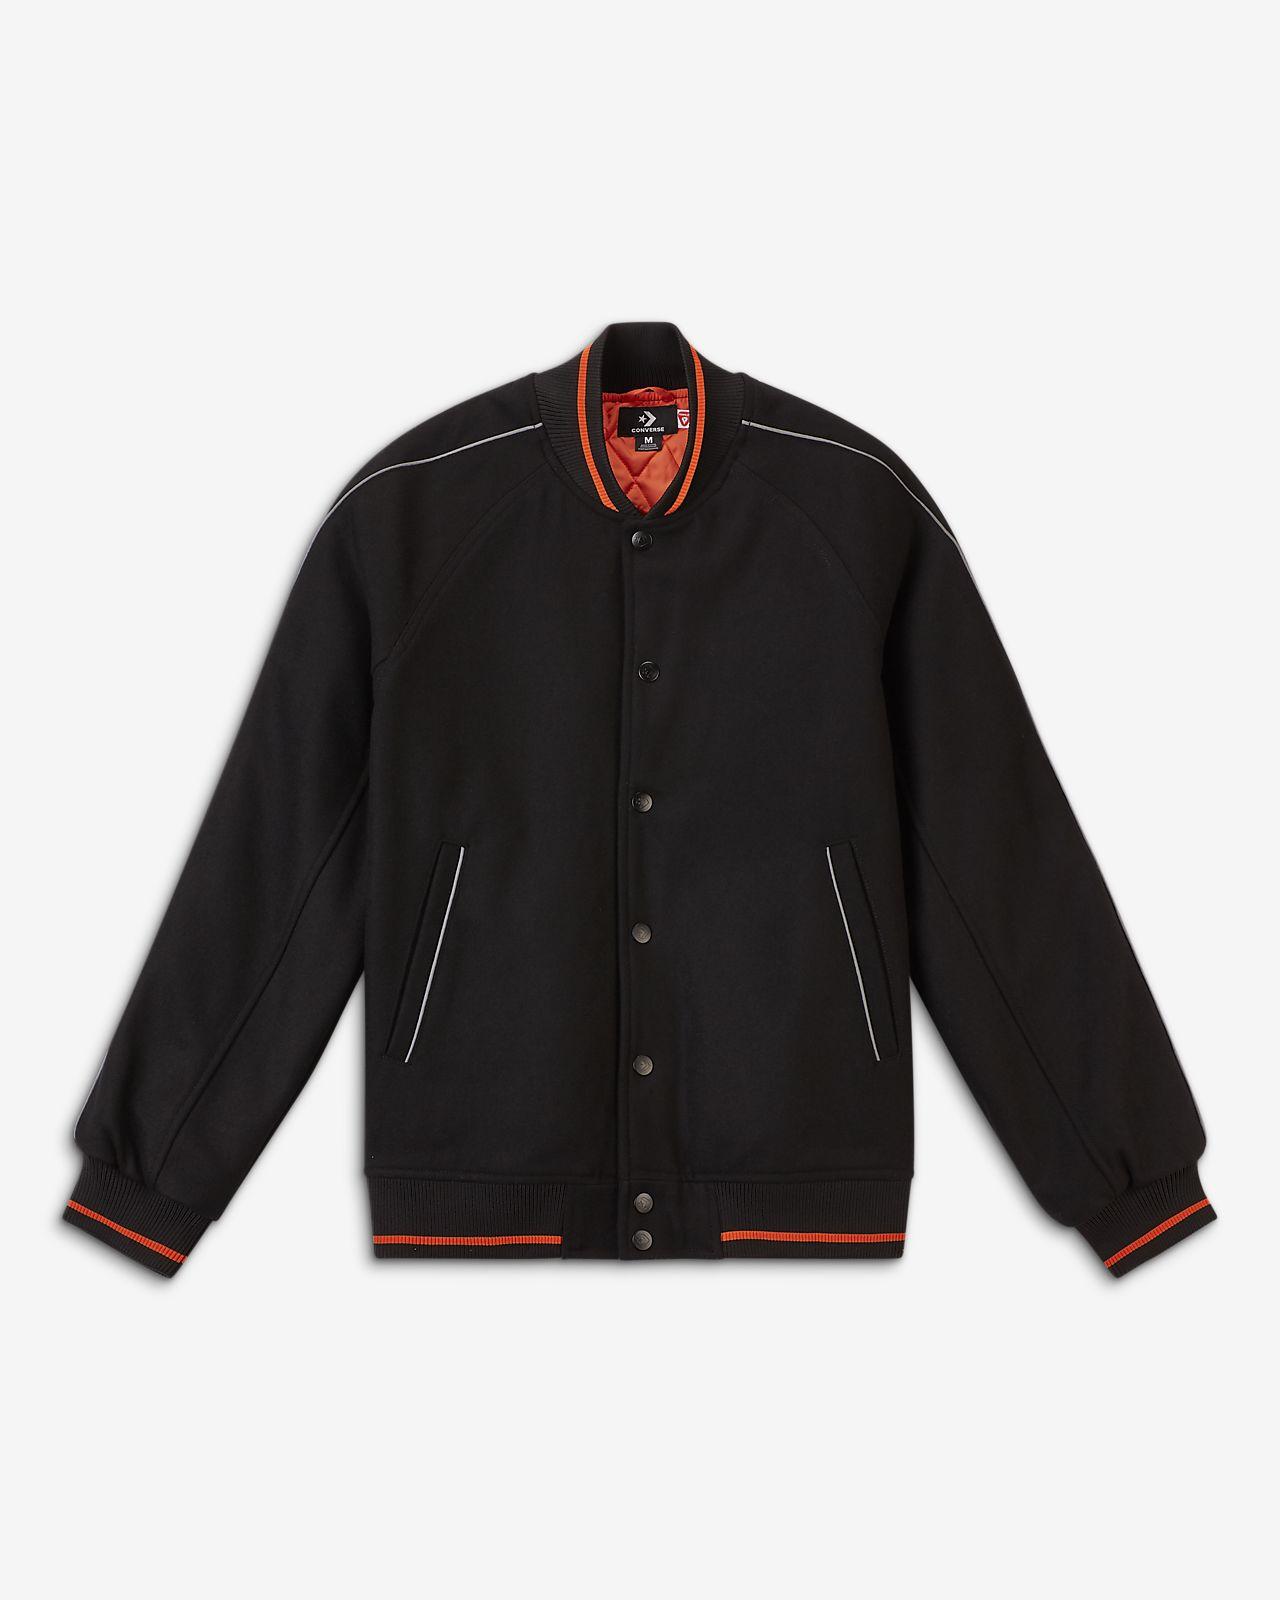 Converse x Vince Staples Men's Insulated Varsity Jacket